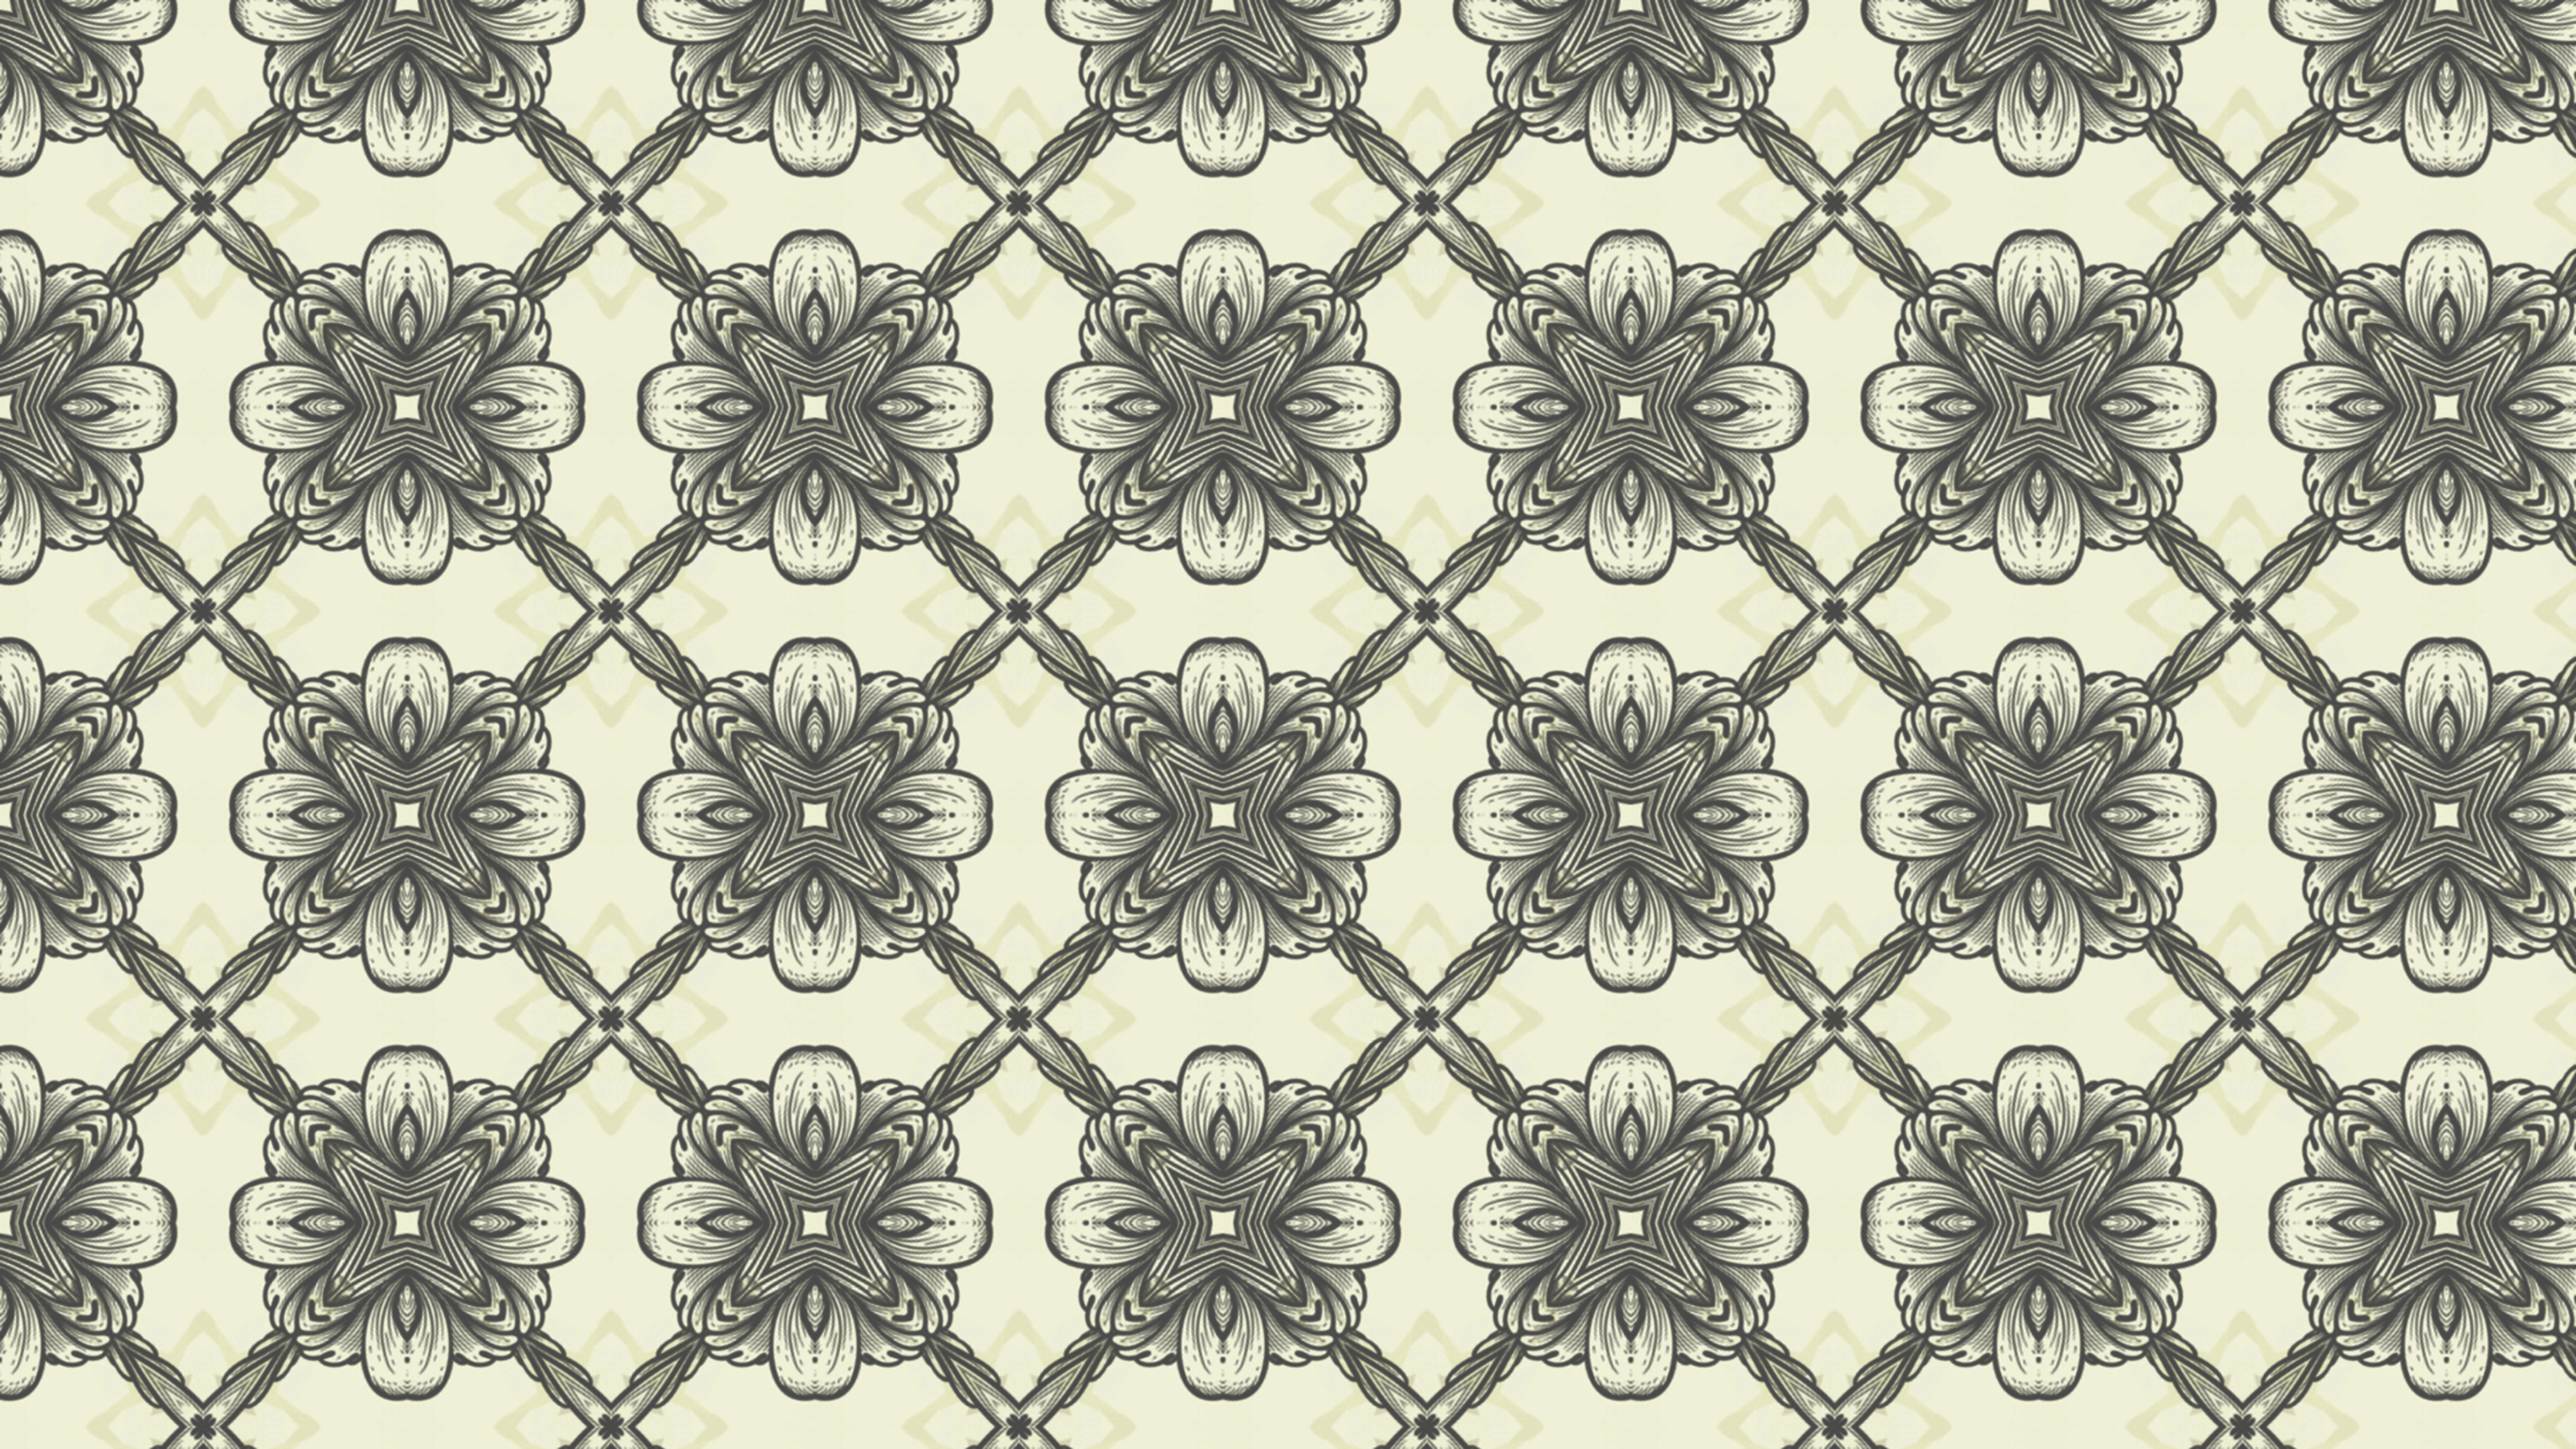 Antique Floral Wallpaper Design Sobace Appscounab Co